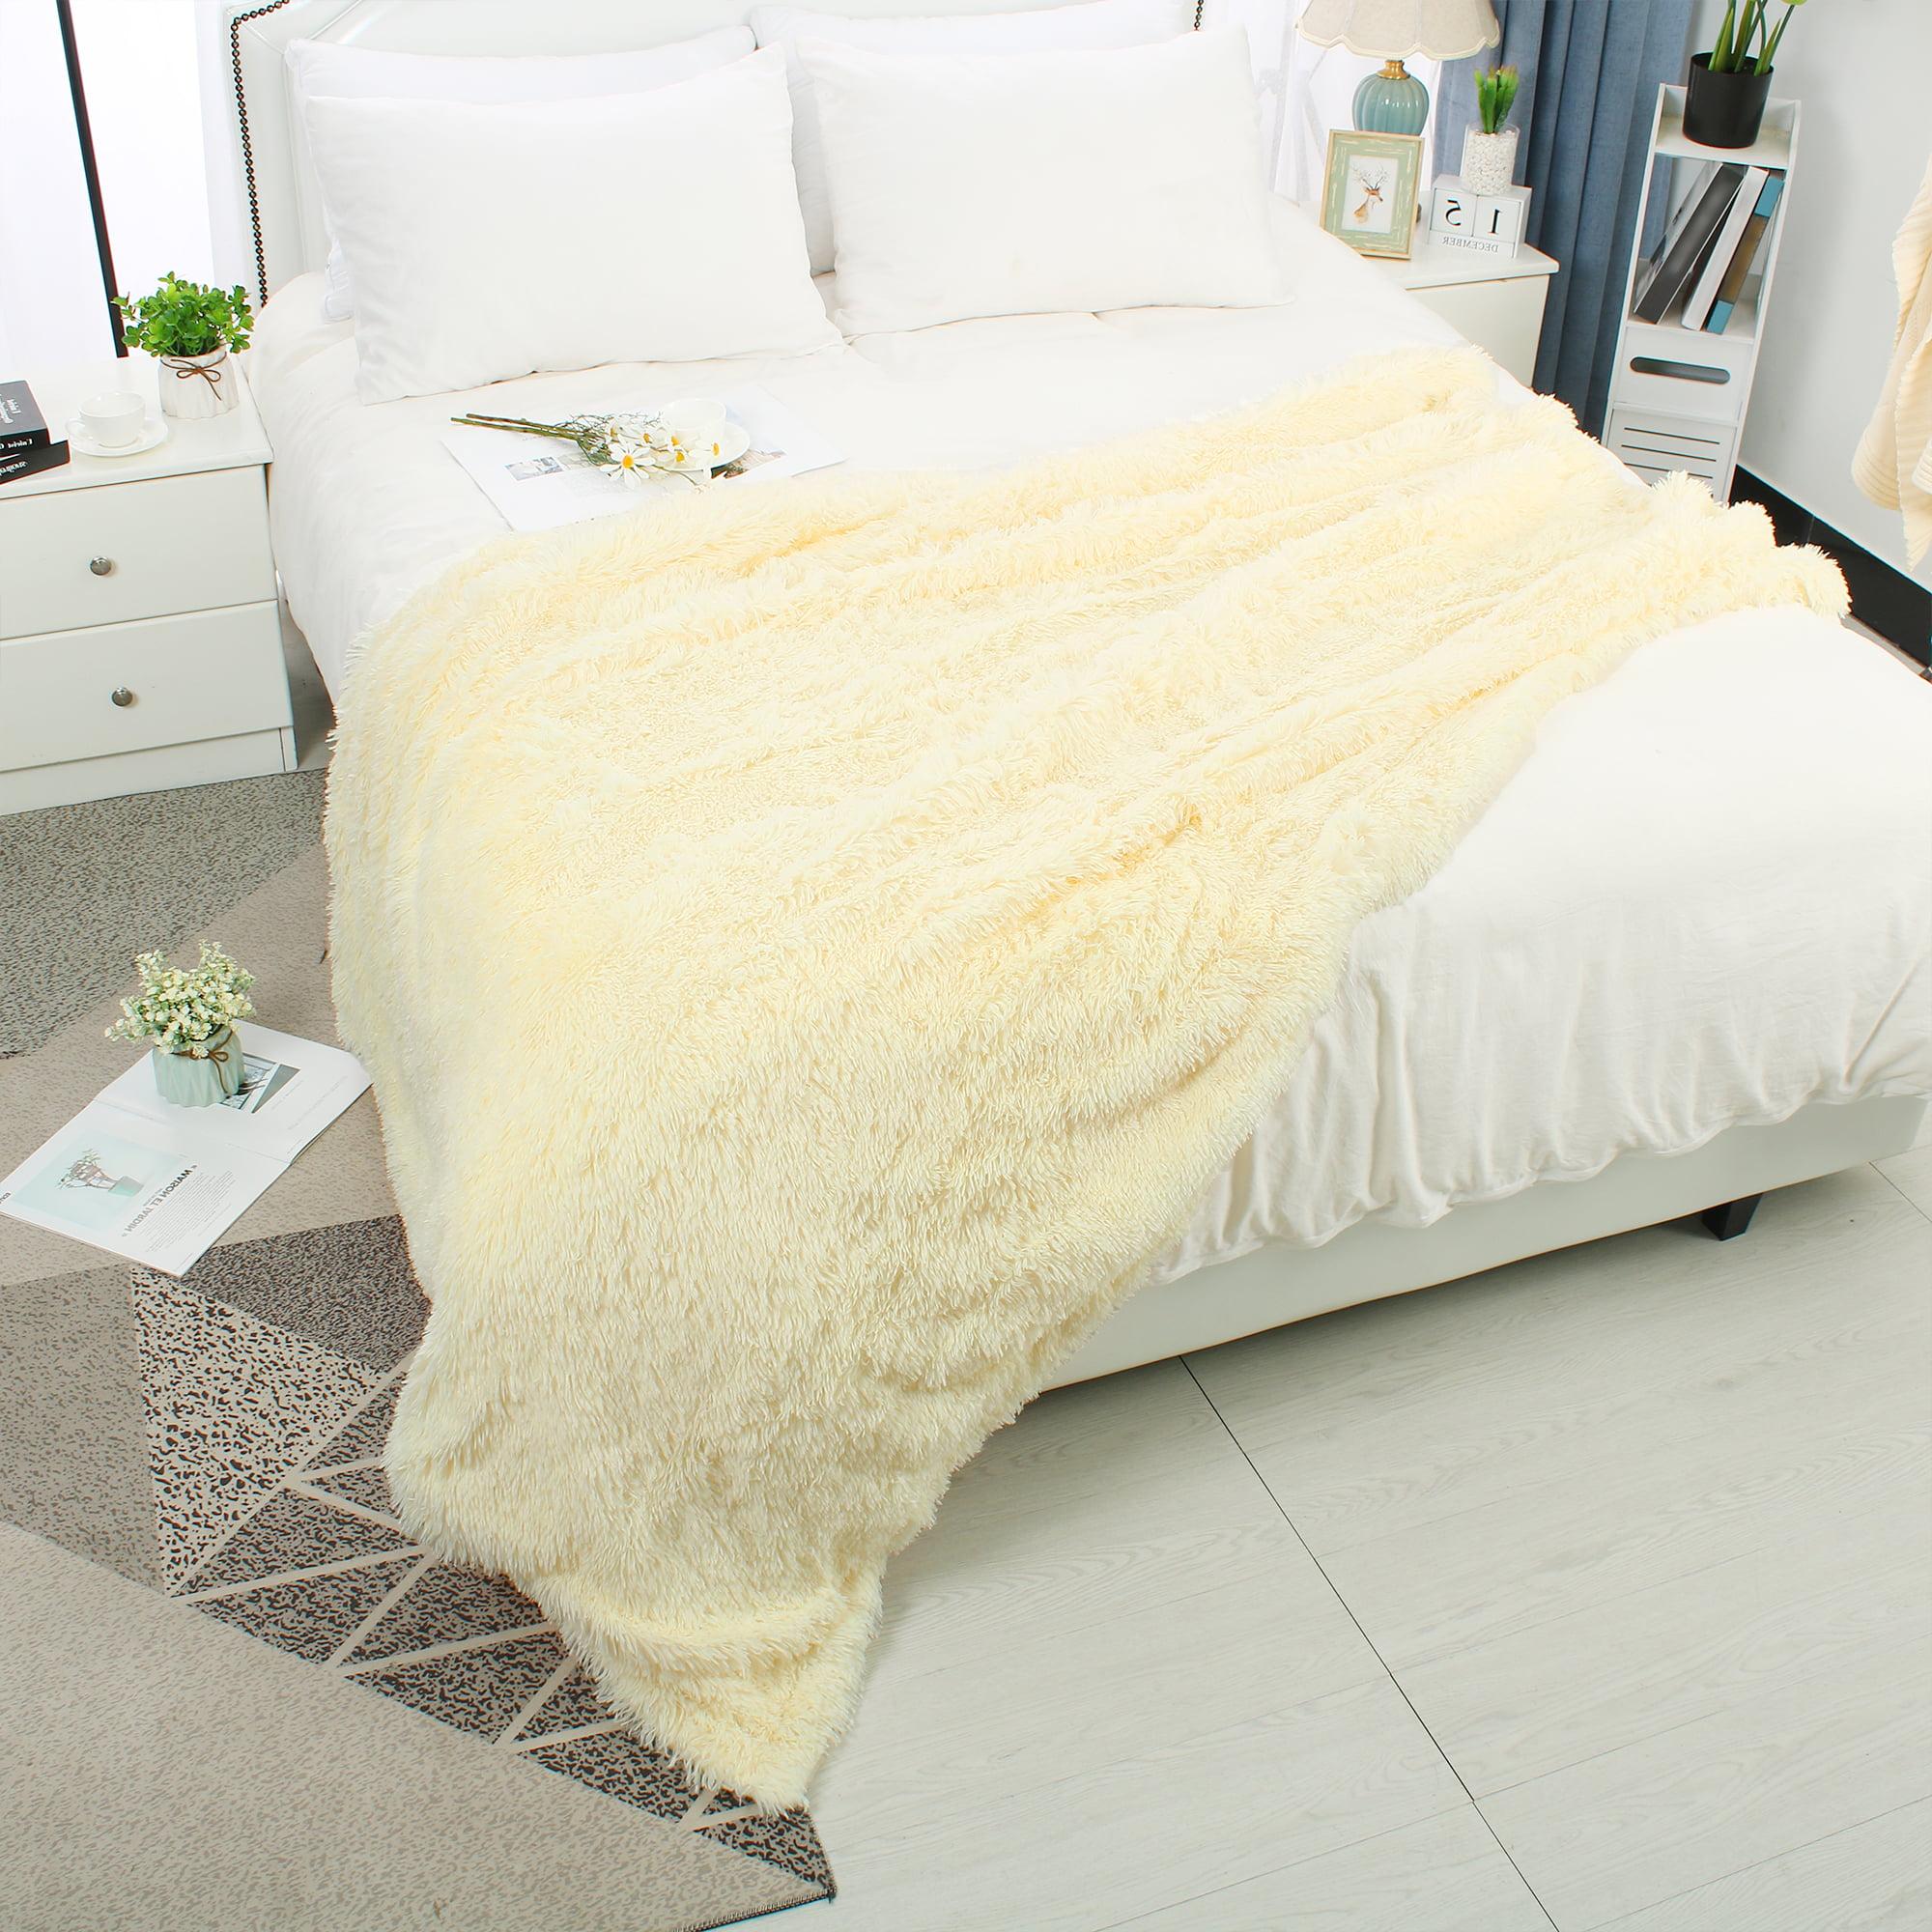 "Soft Decorative Long Shaggy Faux Fur Plush Twin Size Blanket,59"" x78"",Khaki"